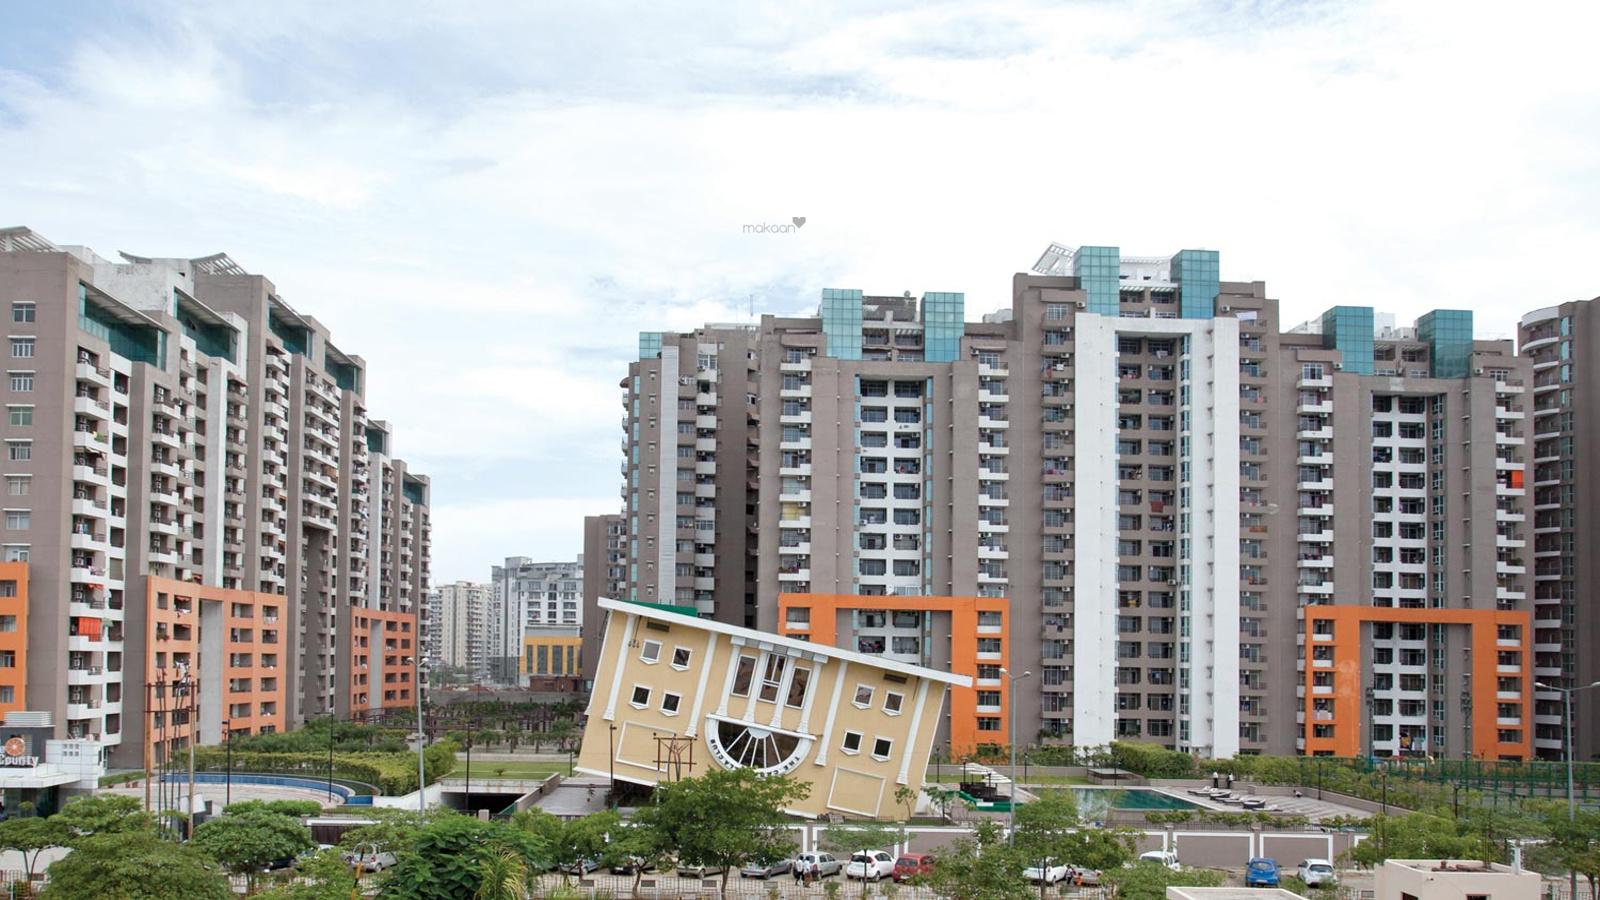 Cloud 9 skylish indirapuram ghaziabad flats in indirapuram price - Popular Projects In Indirapuram Find Hot Projects For Sale In Indirapuram Ghaziabad